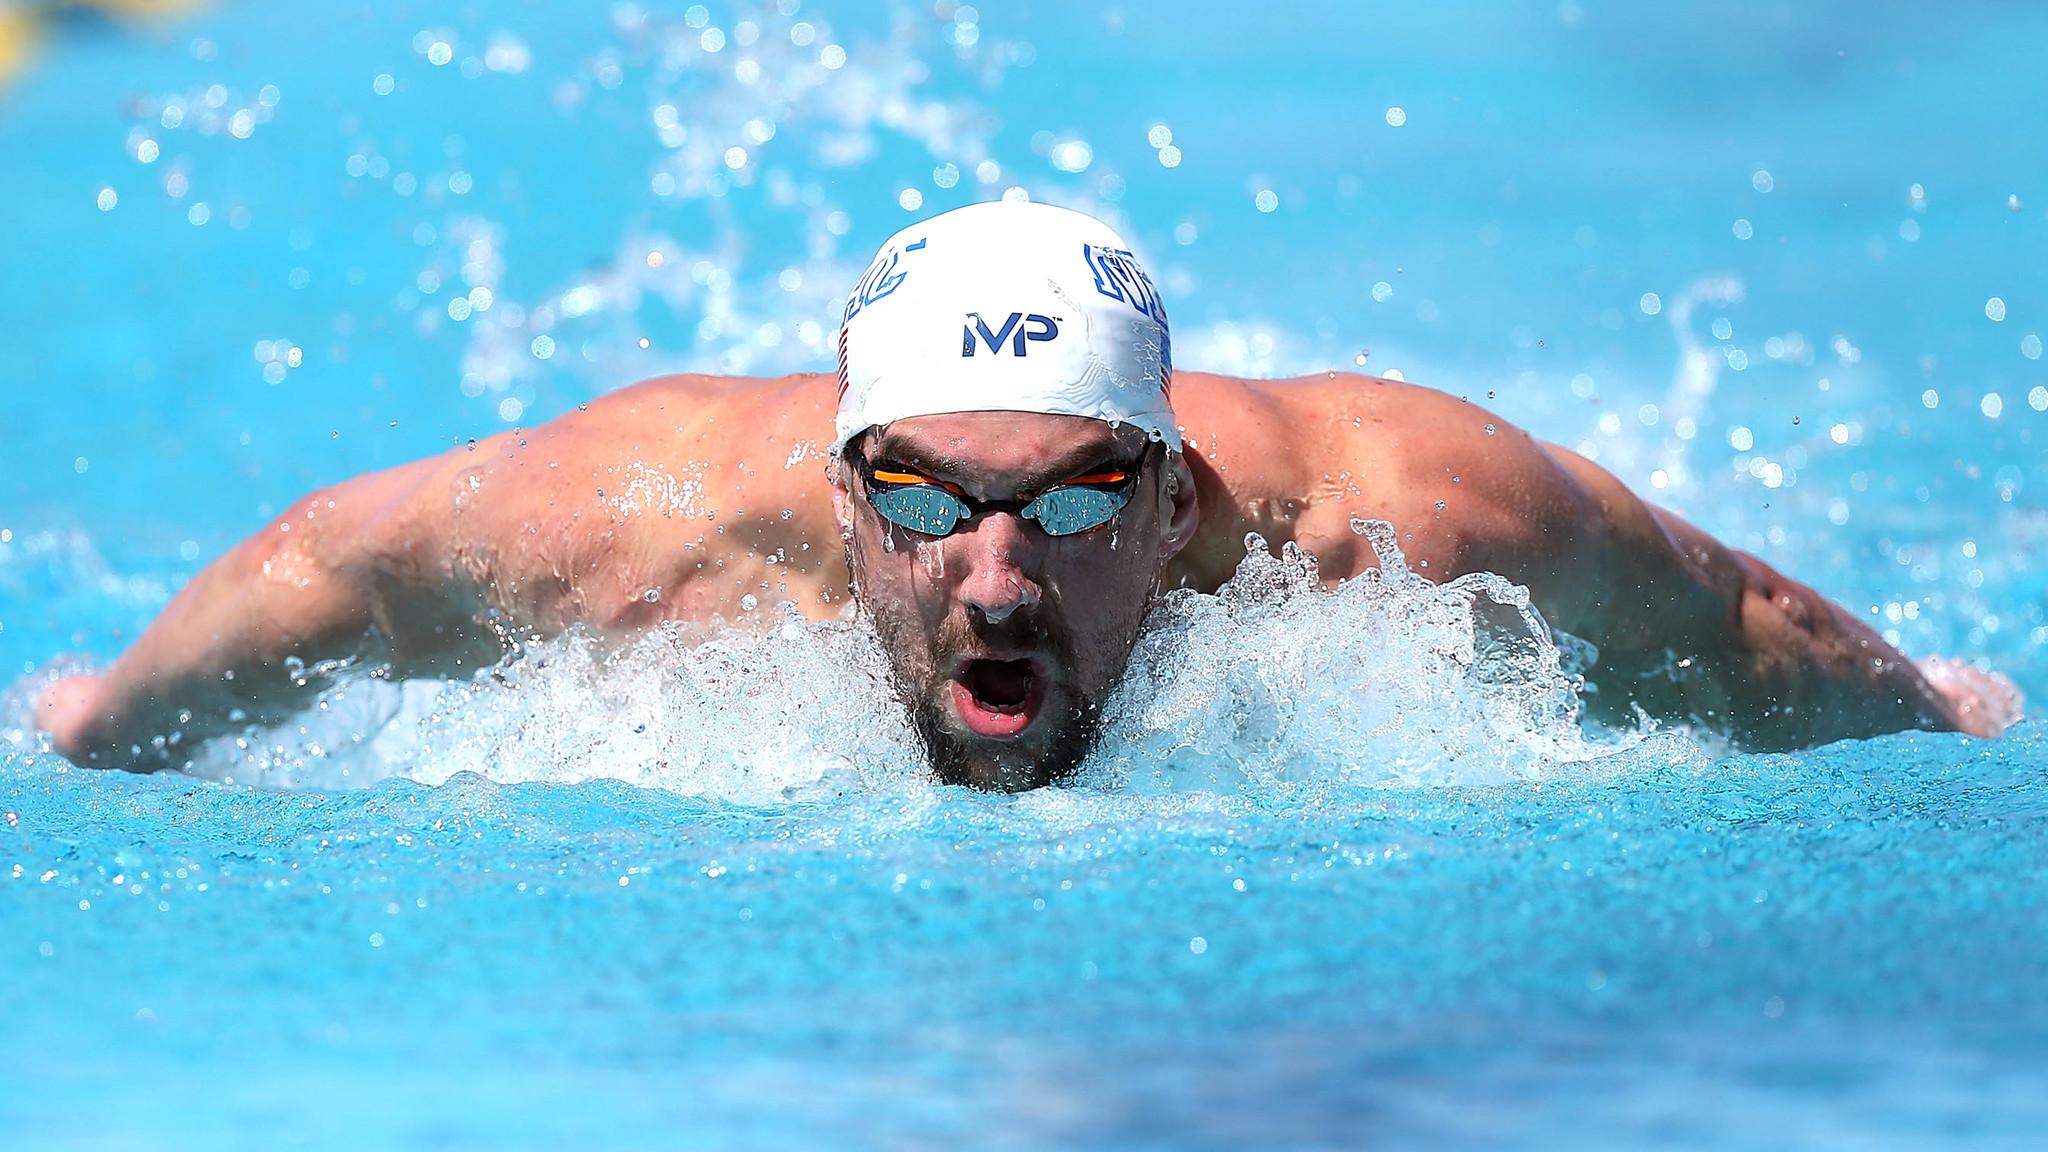 Huyền thoại Michael Phelps.